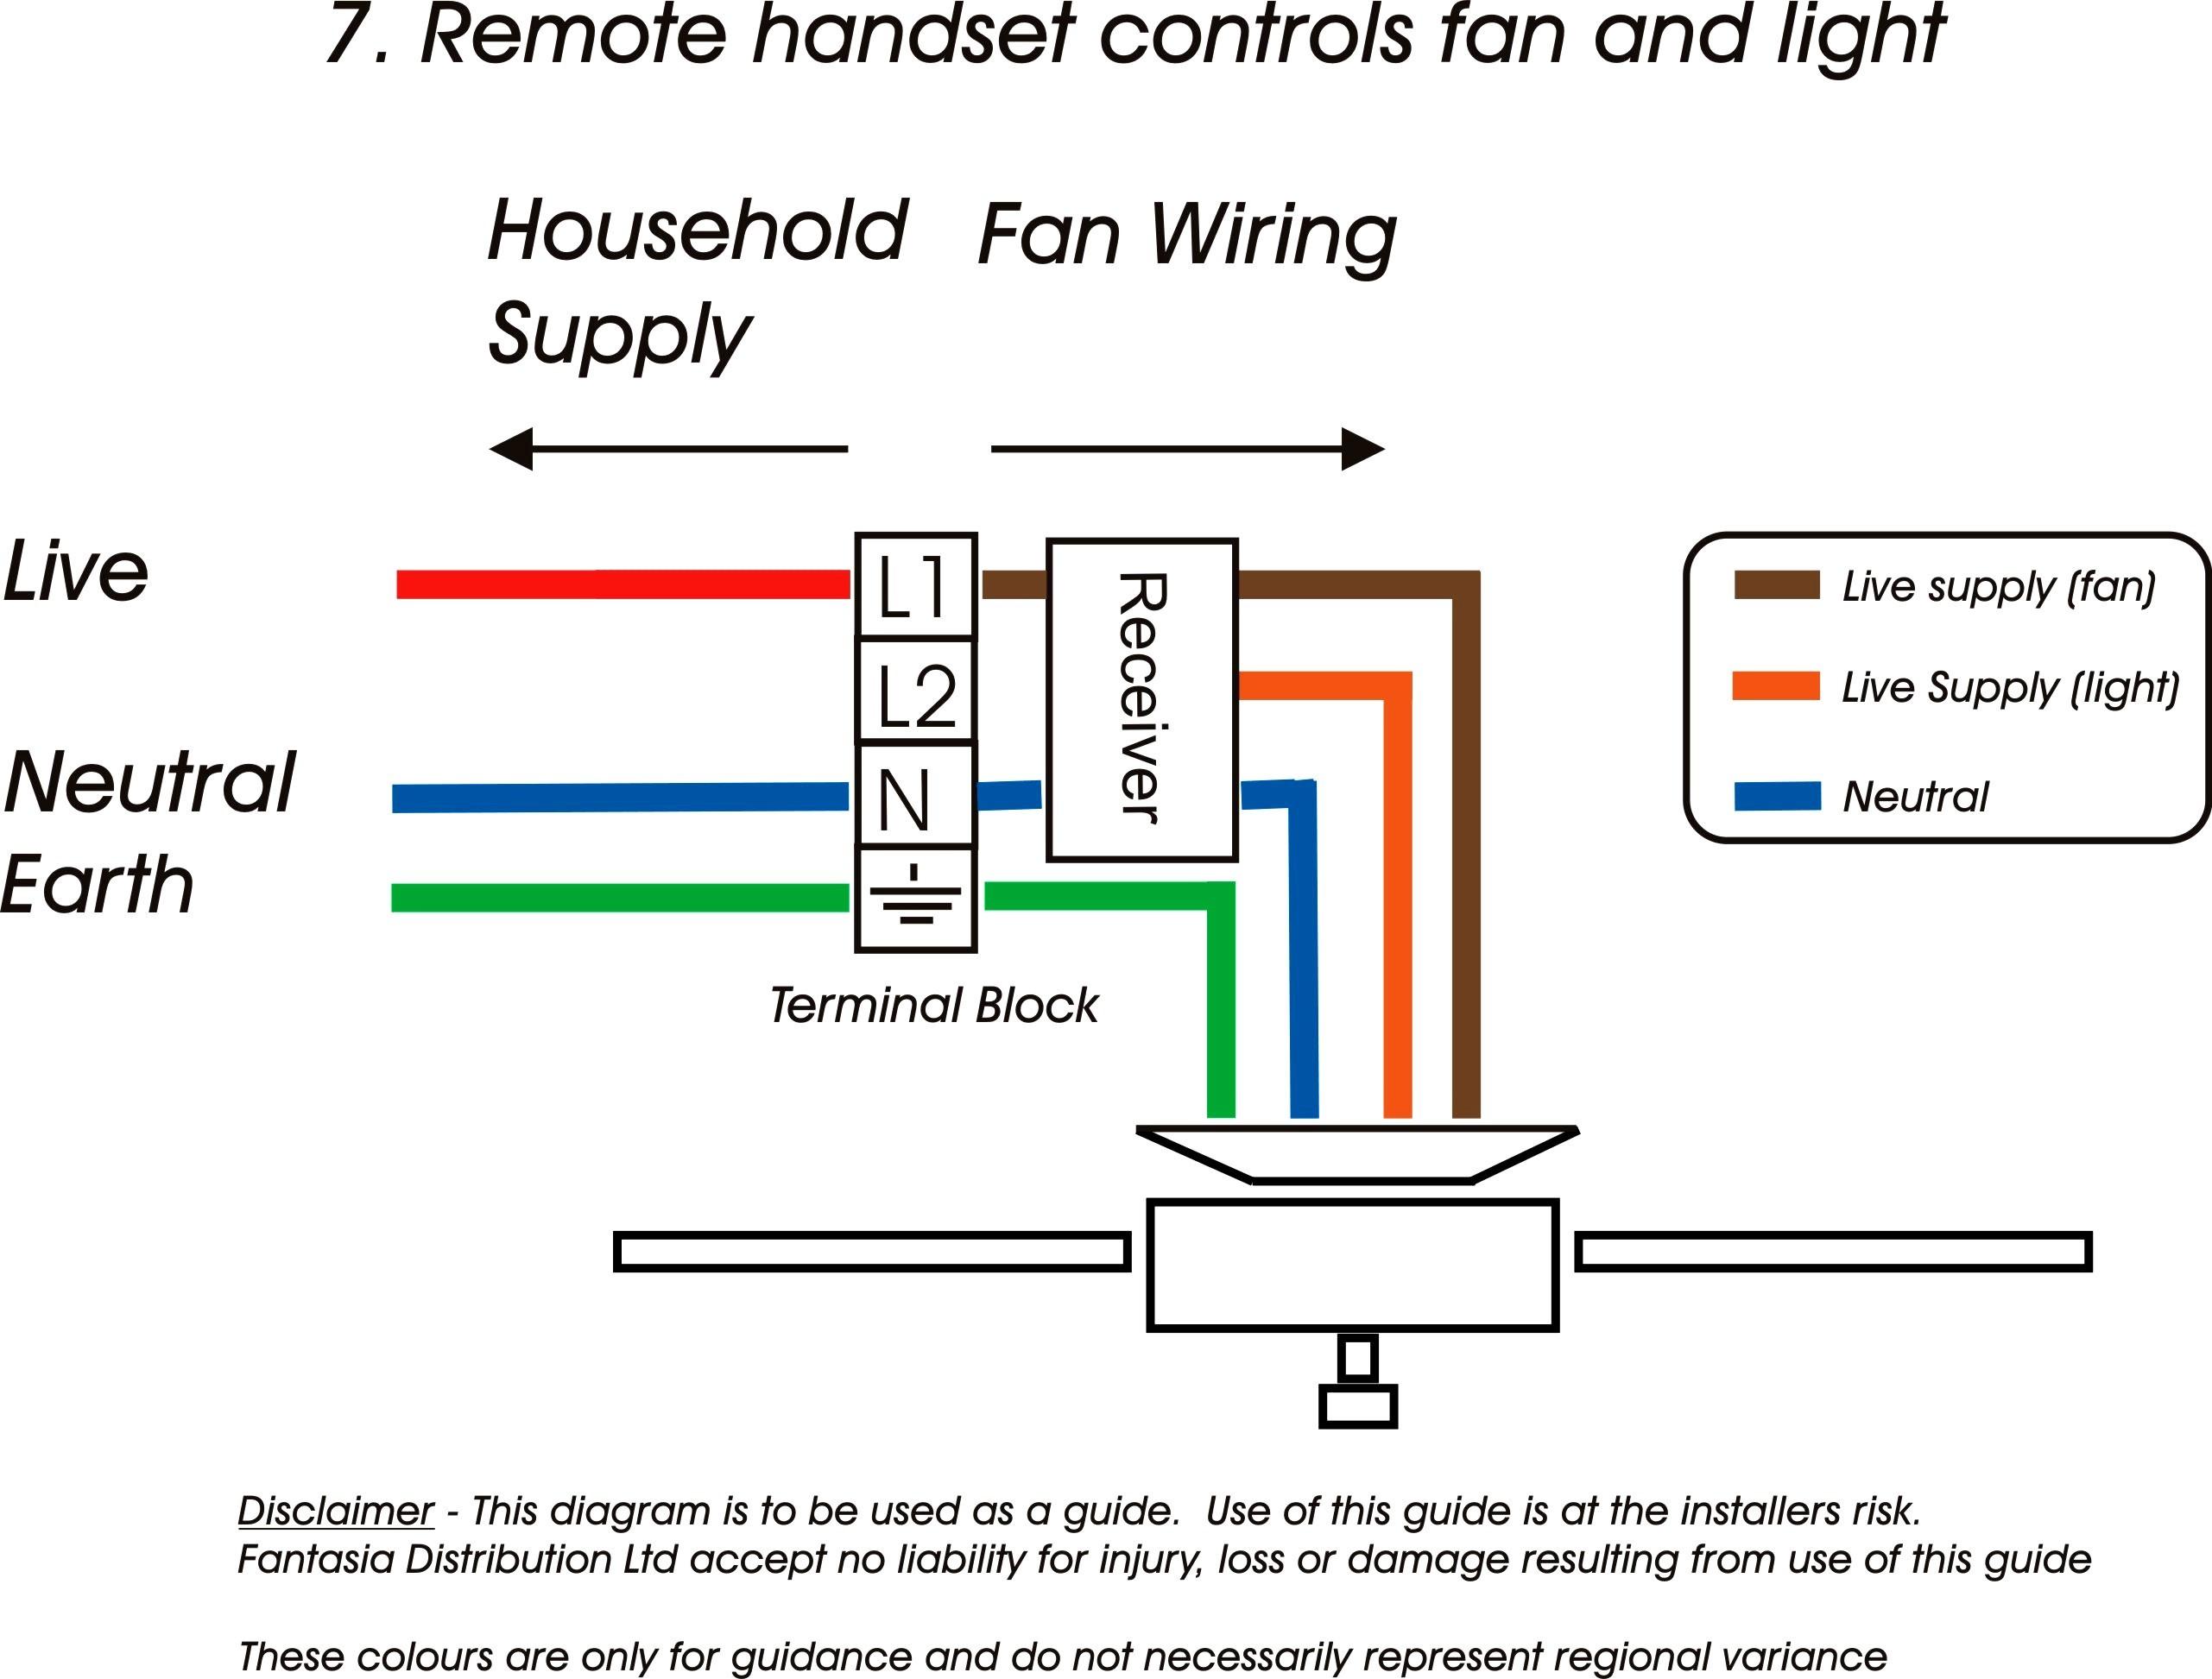 westinghouse ceiling fan wiring diagram natebird me rh natebird me 3 Speed Ceiling Fan Wiring Diagram